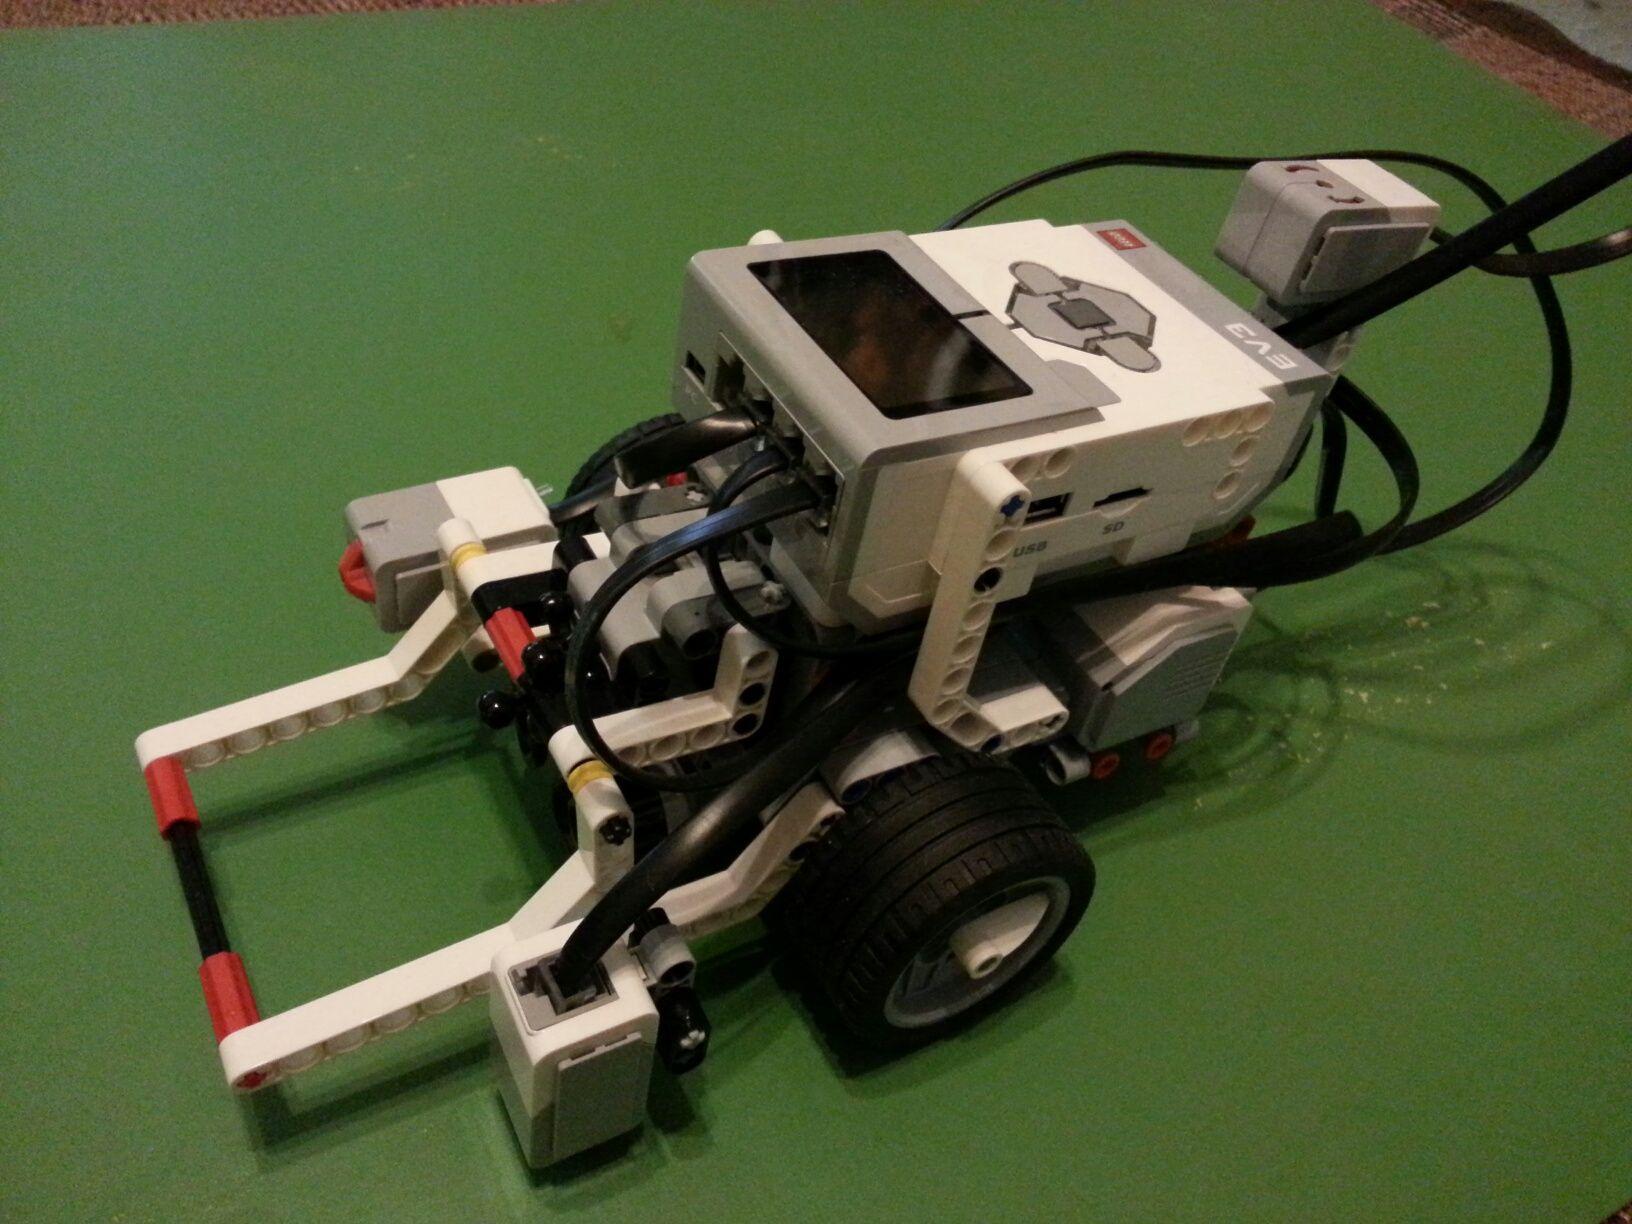 Fll Robot Design Google Search Fll Robot Design Pinterest